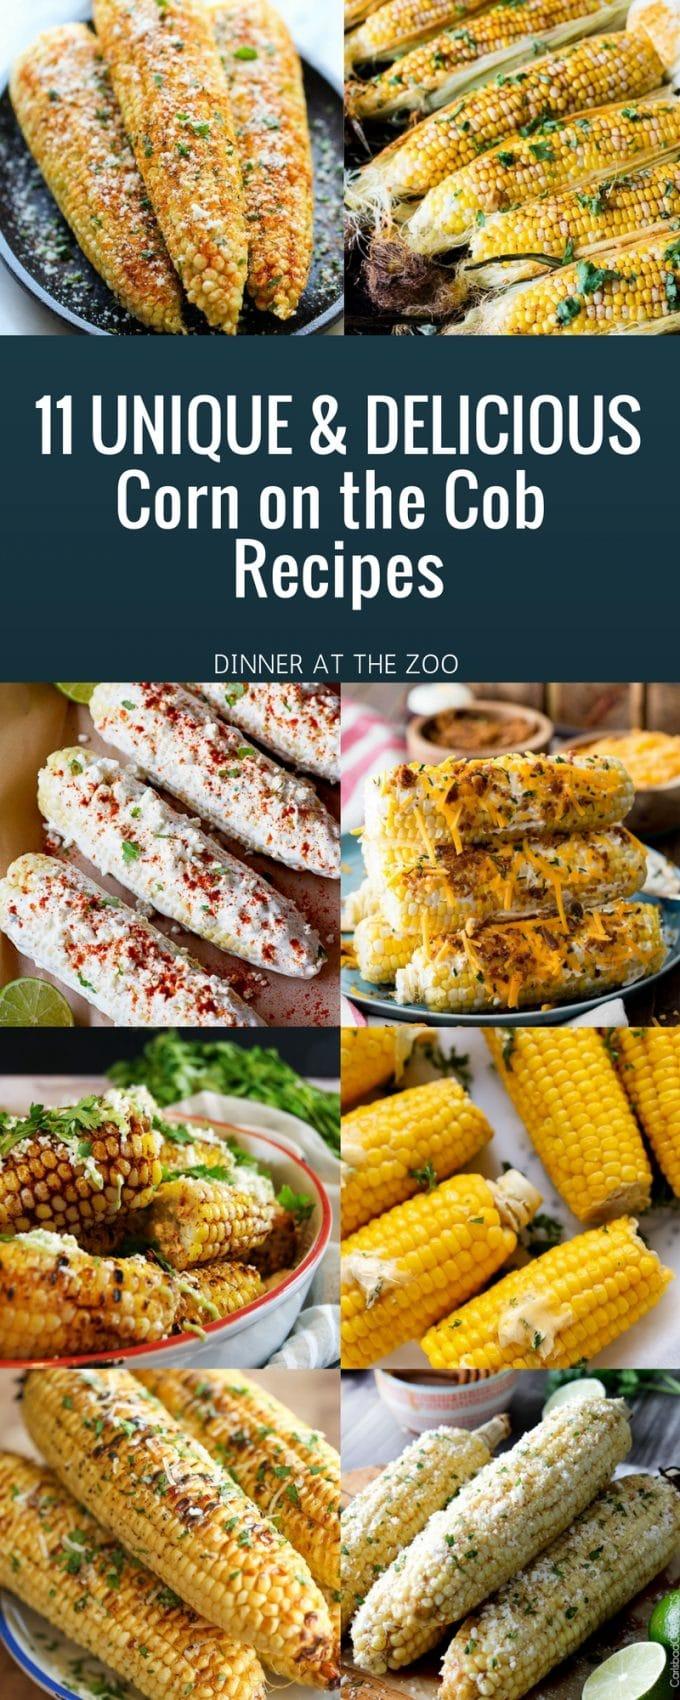 11 Delicious & Unique Corn on the Cob Recipes #corn #grilling #sidedish #summer #dinneratthezoo